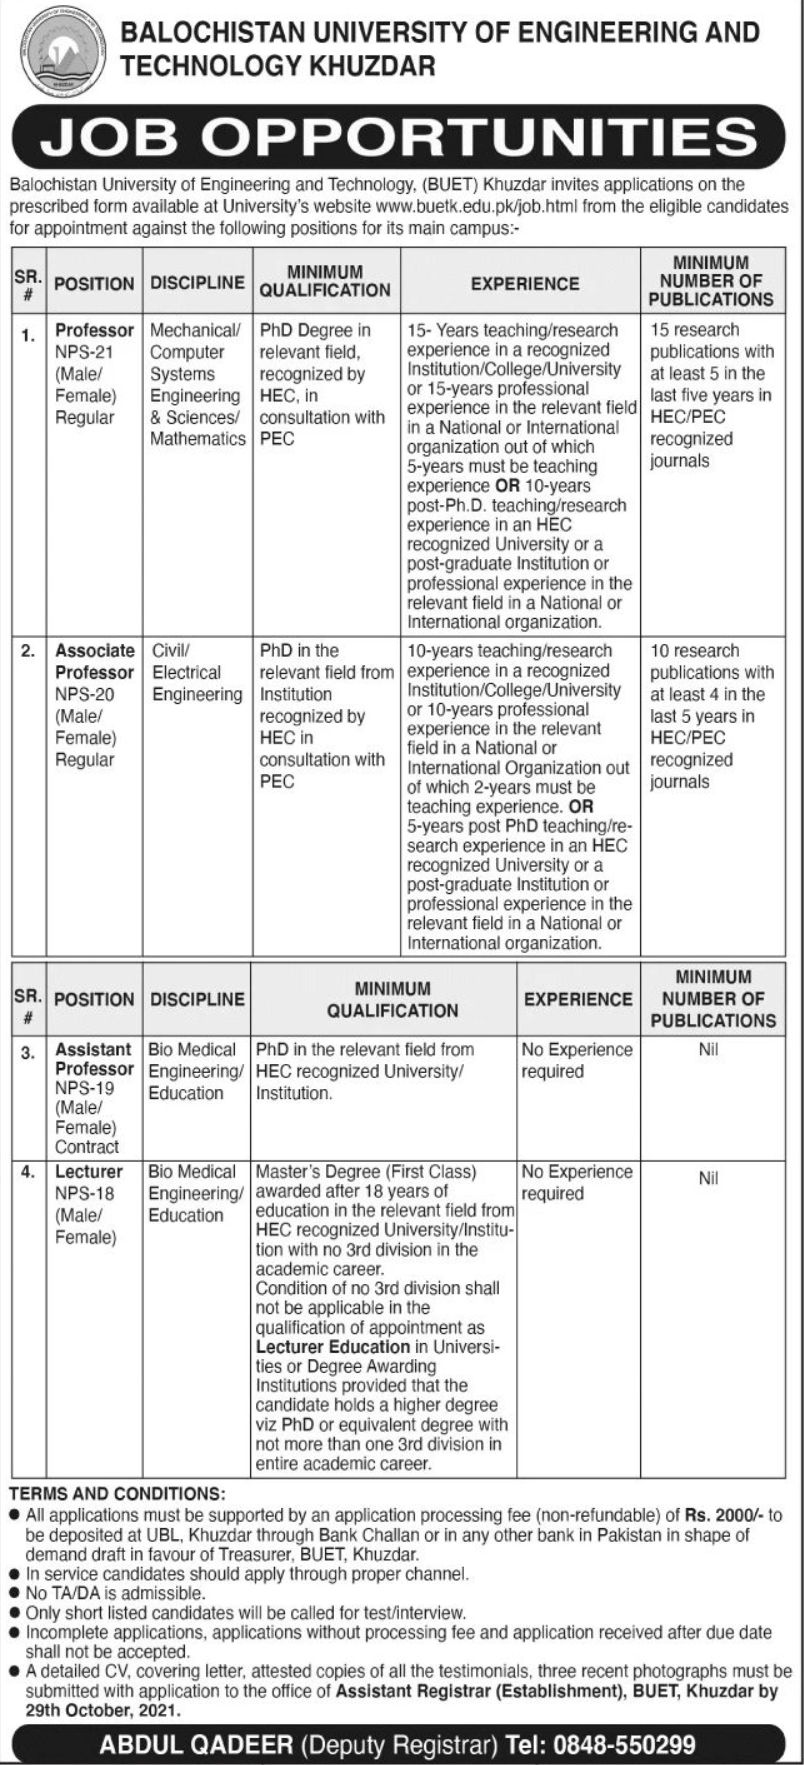 Balochistan University of Engineering and Technology Khuzdar Vacancies 2021 – Latest Jobs 3